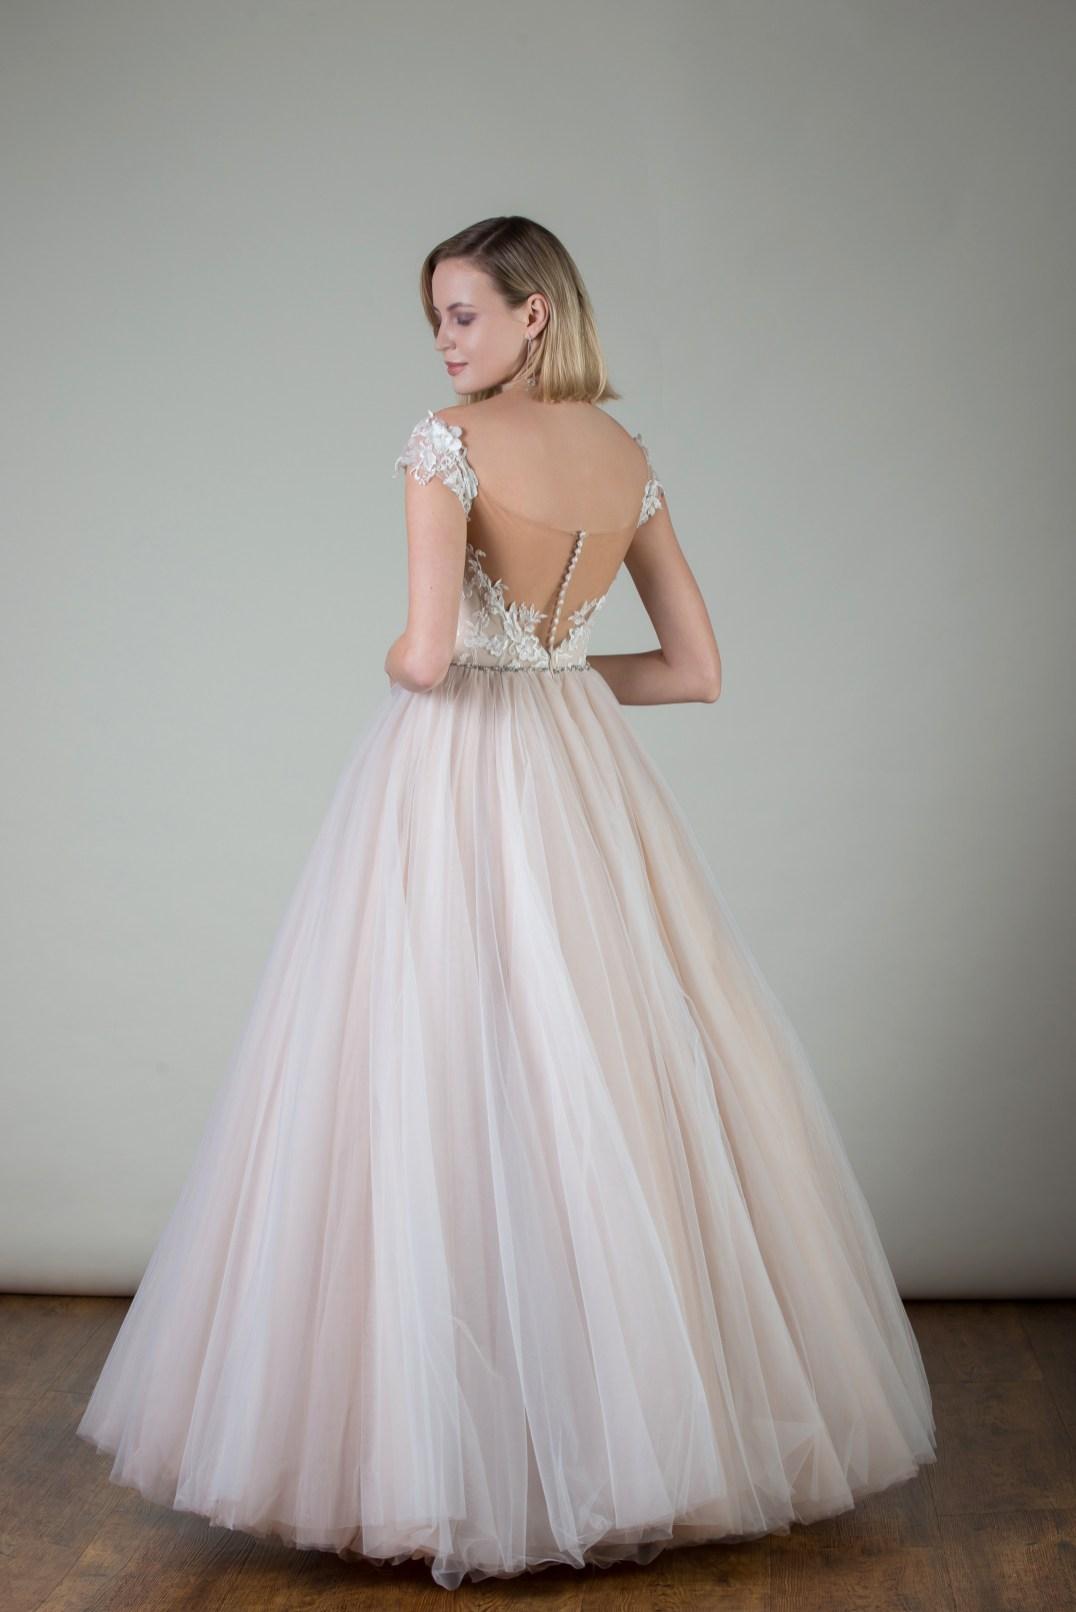 MiaMia Ashlyn wedding dress